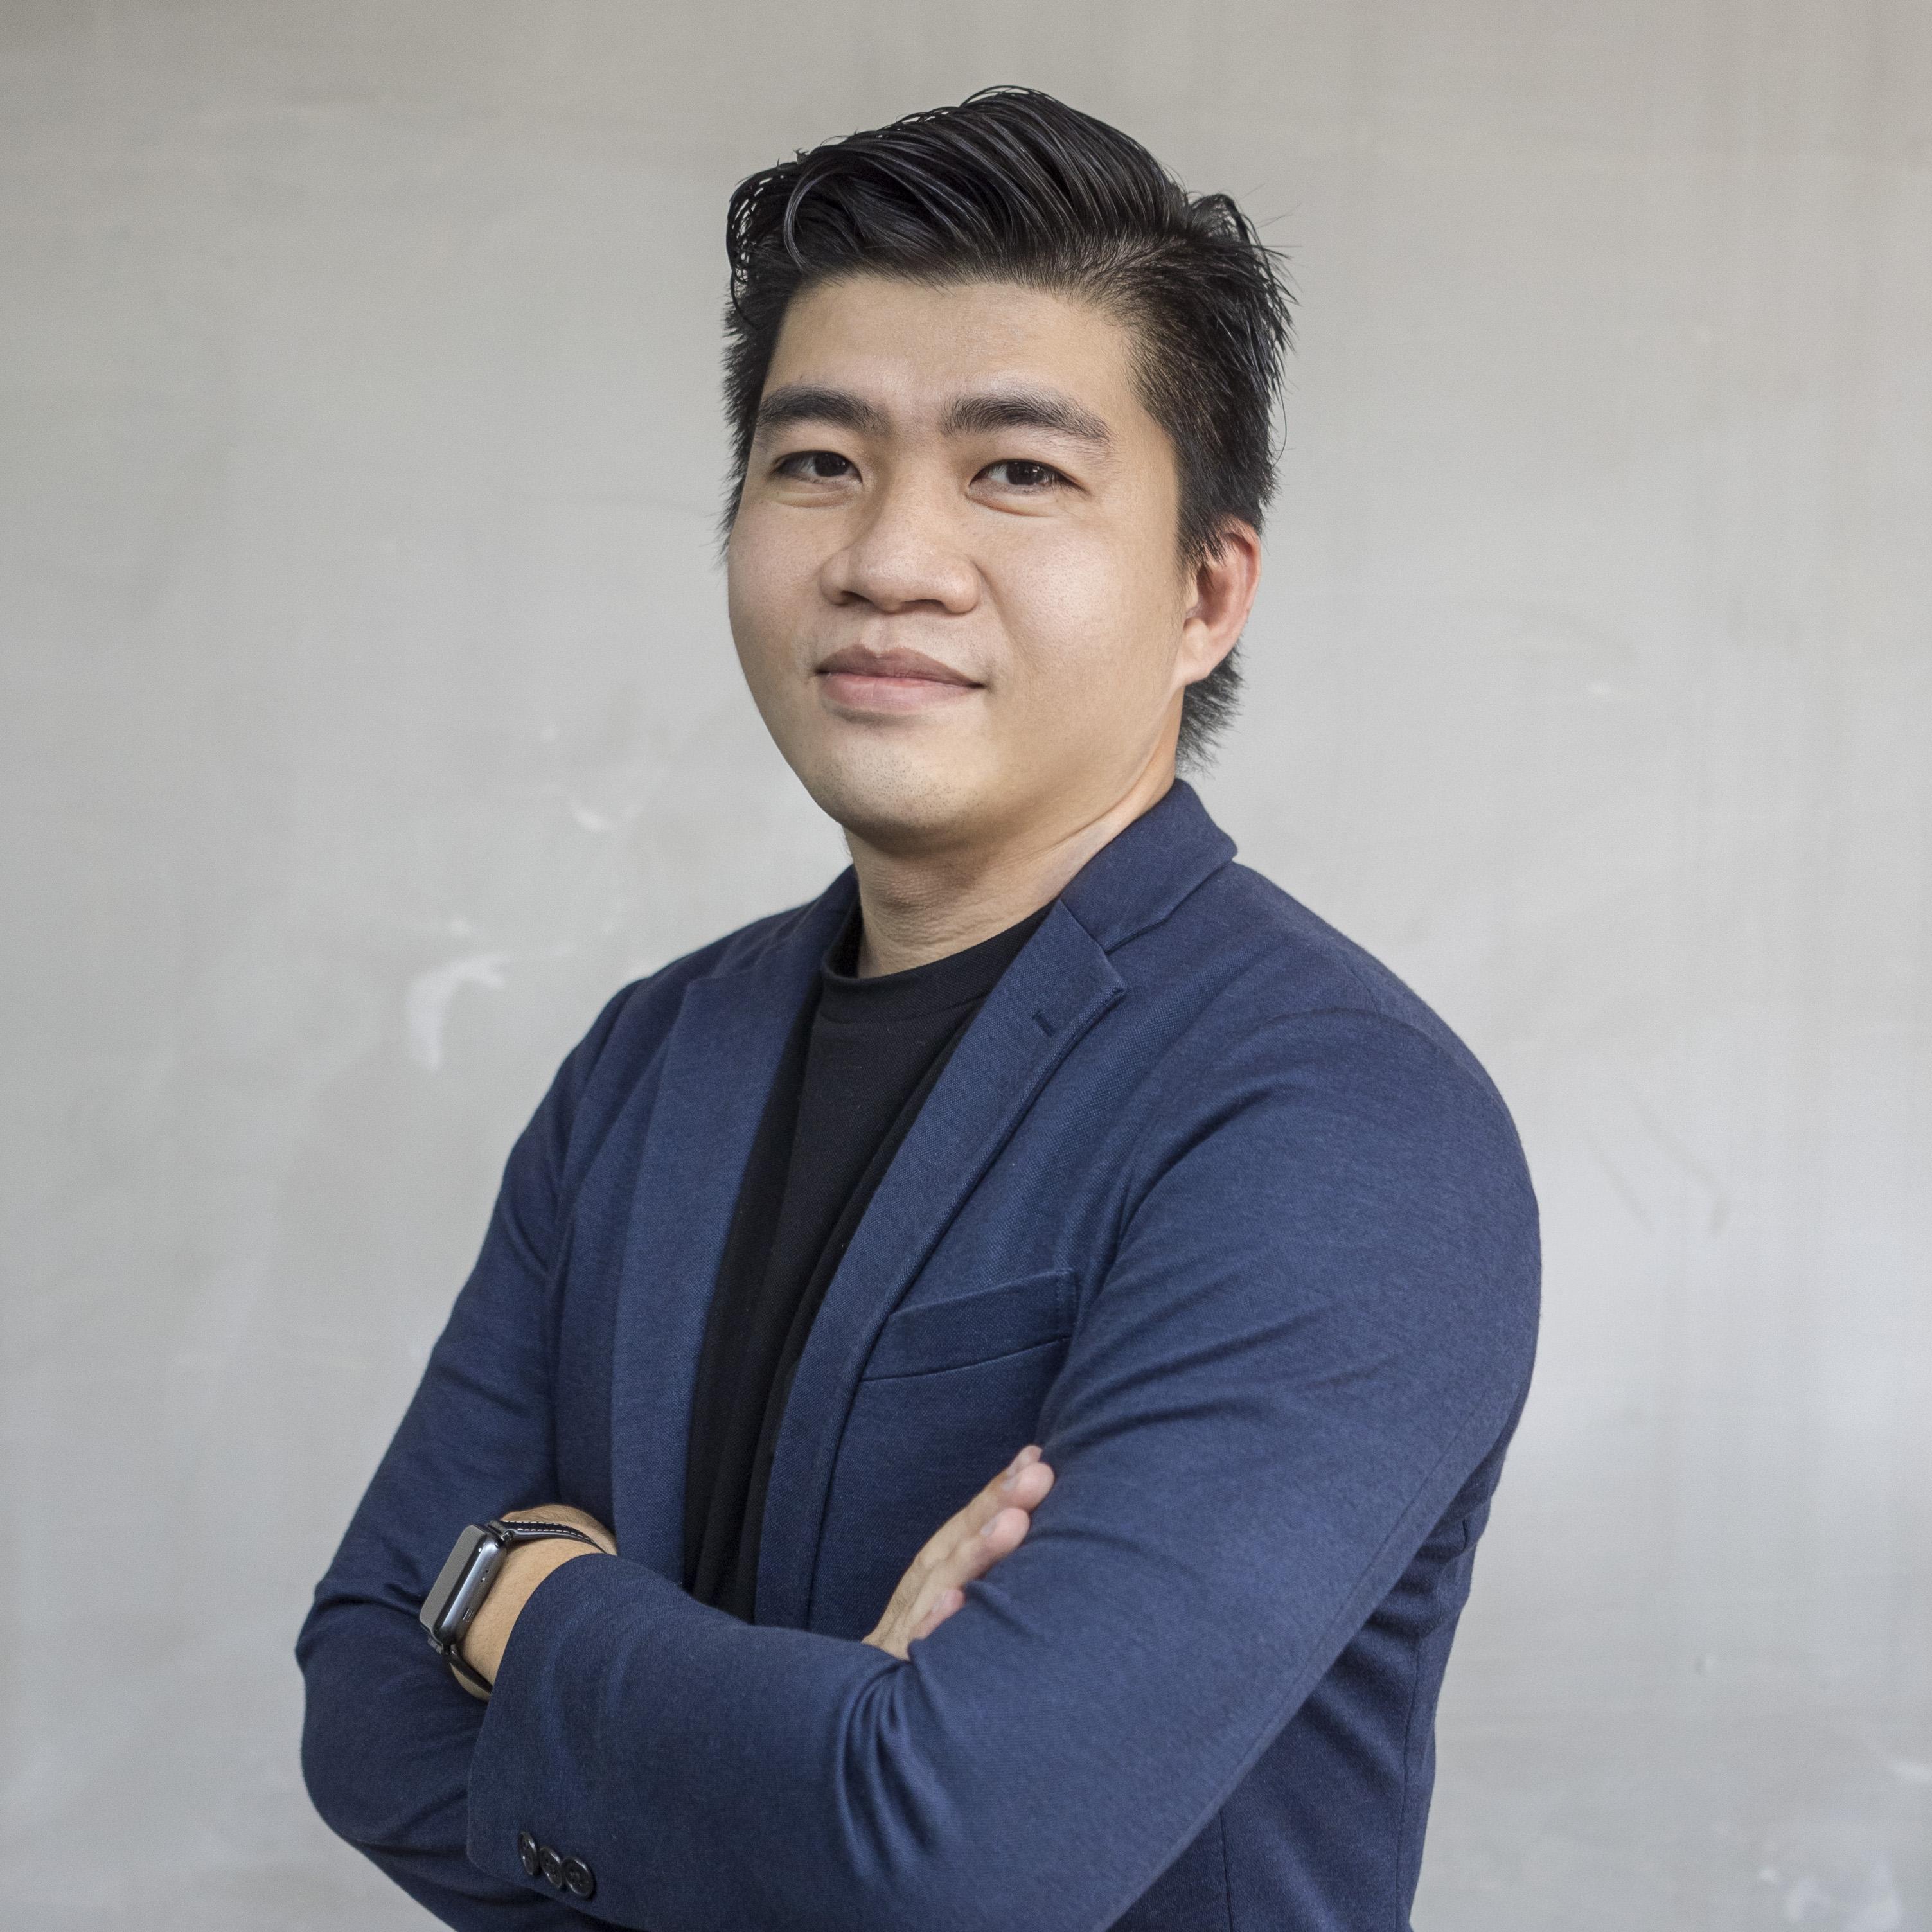 Mr. Trung Lam